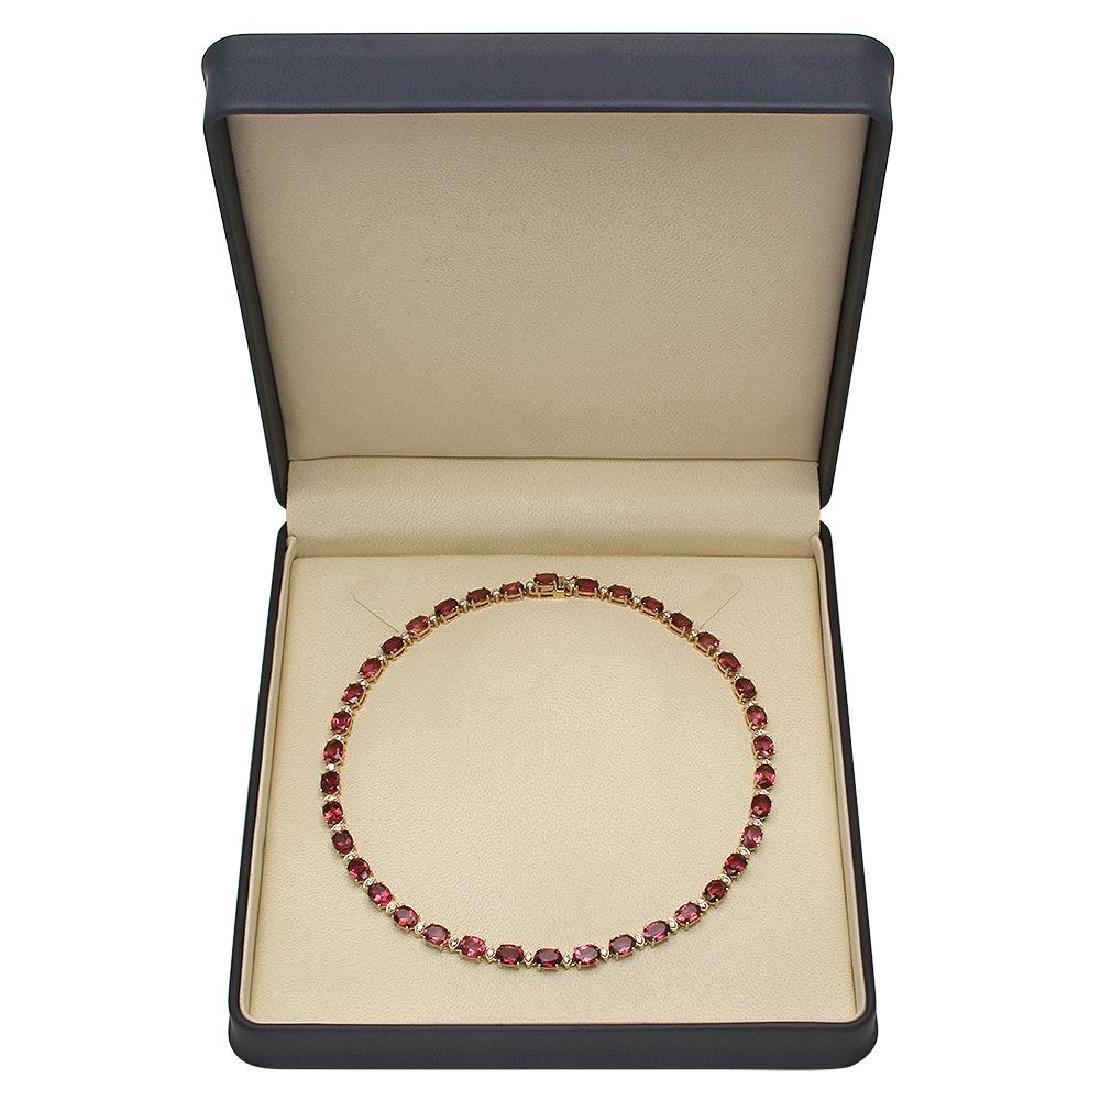 14K Gold 44.66ct Tourmaline 1.93ct Diamond Necklace - 4